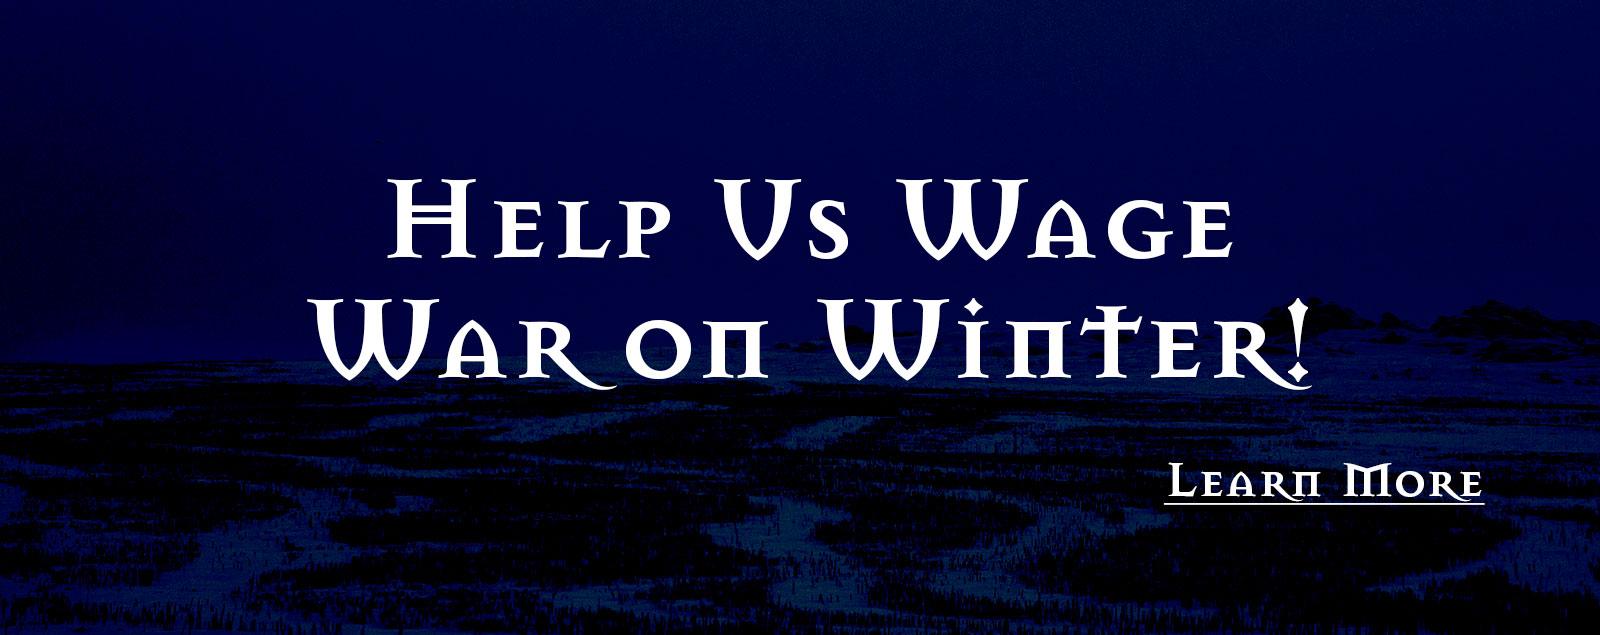 Help Us Wage War on Winter